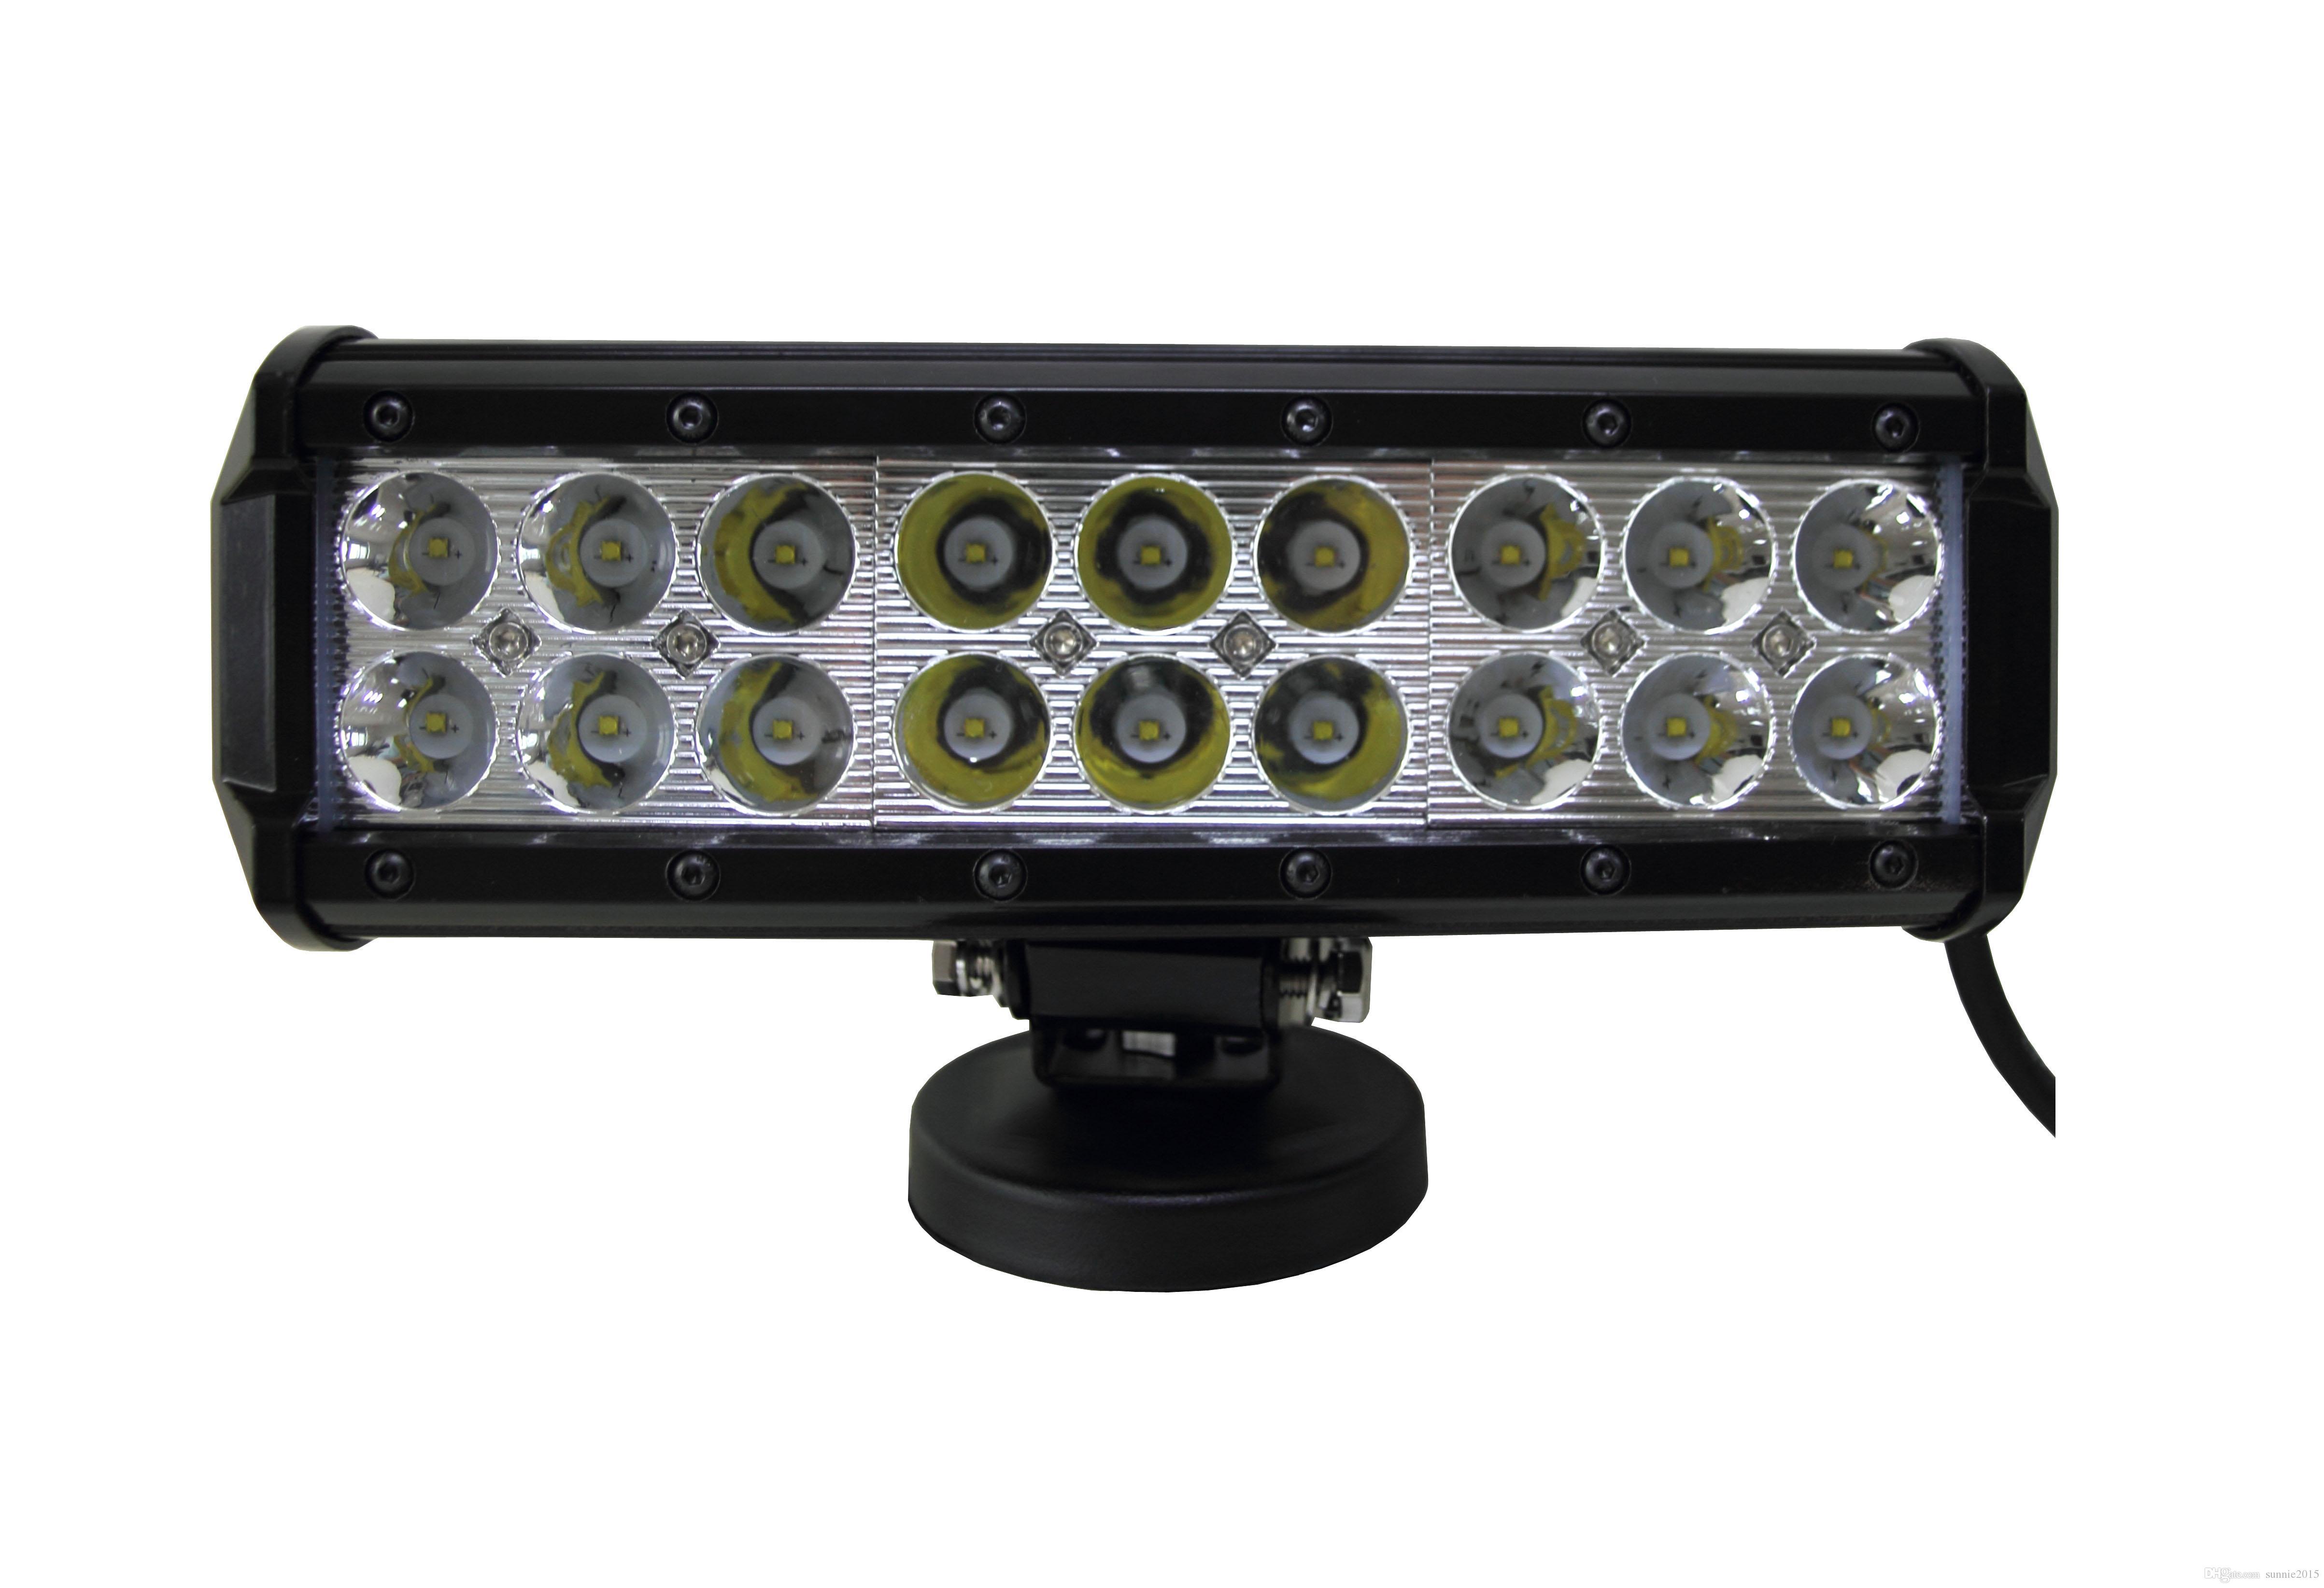 "Büyük indirim Yeni! 9 ""54 W CREE LED İş Işık Çubuğu SUV ATV 4WD Off-road 4x4 Tekne SUV UTE Off-road SPOT AKIŞ COMBO Işın 12 V / 24 V 4590lm"